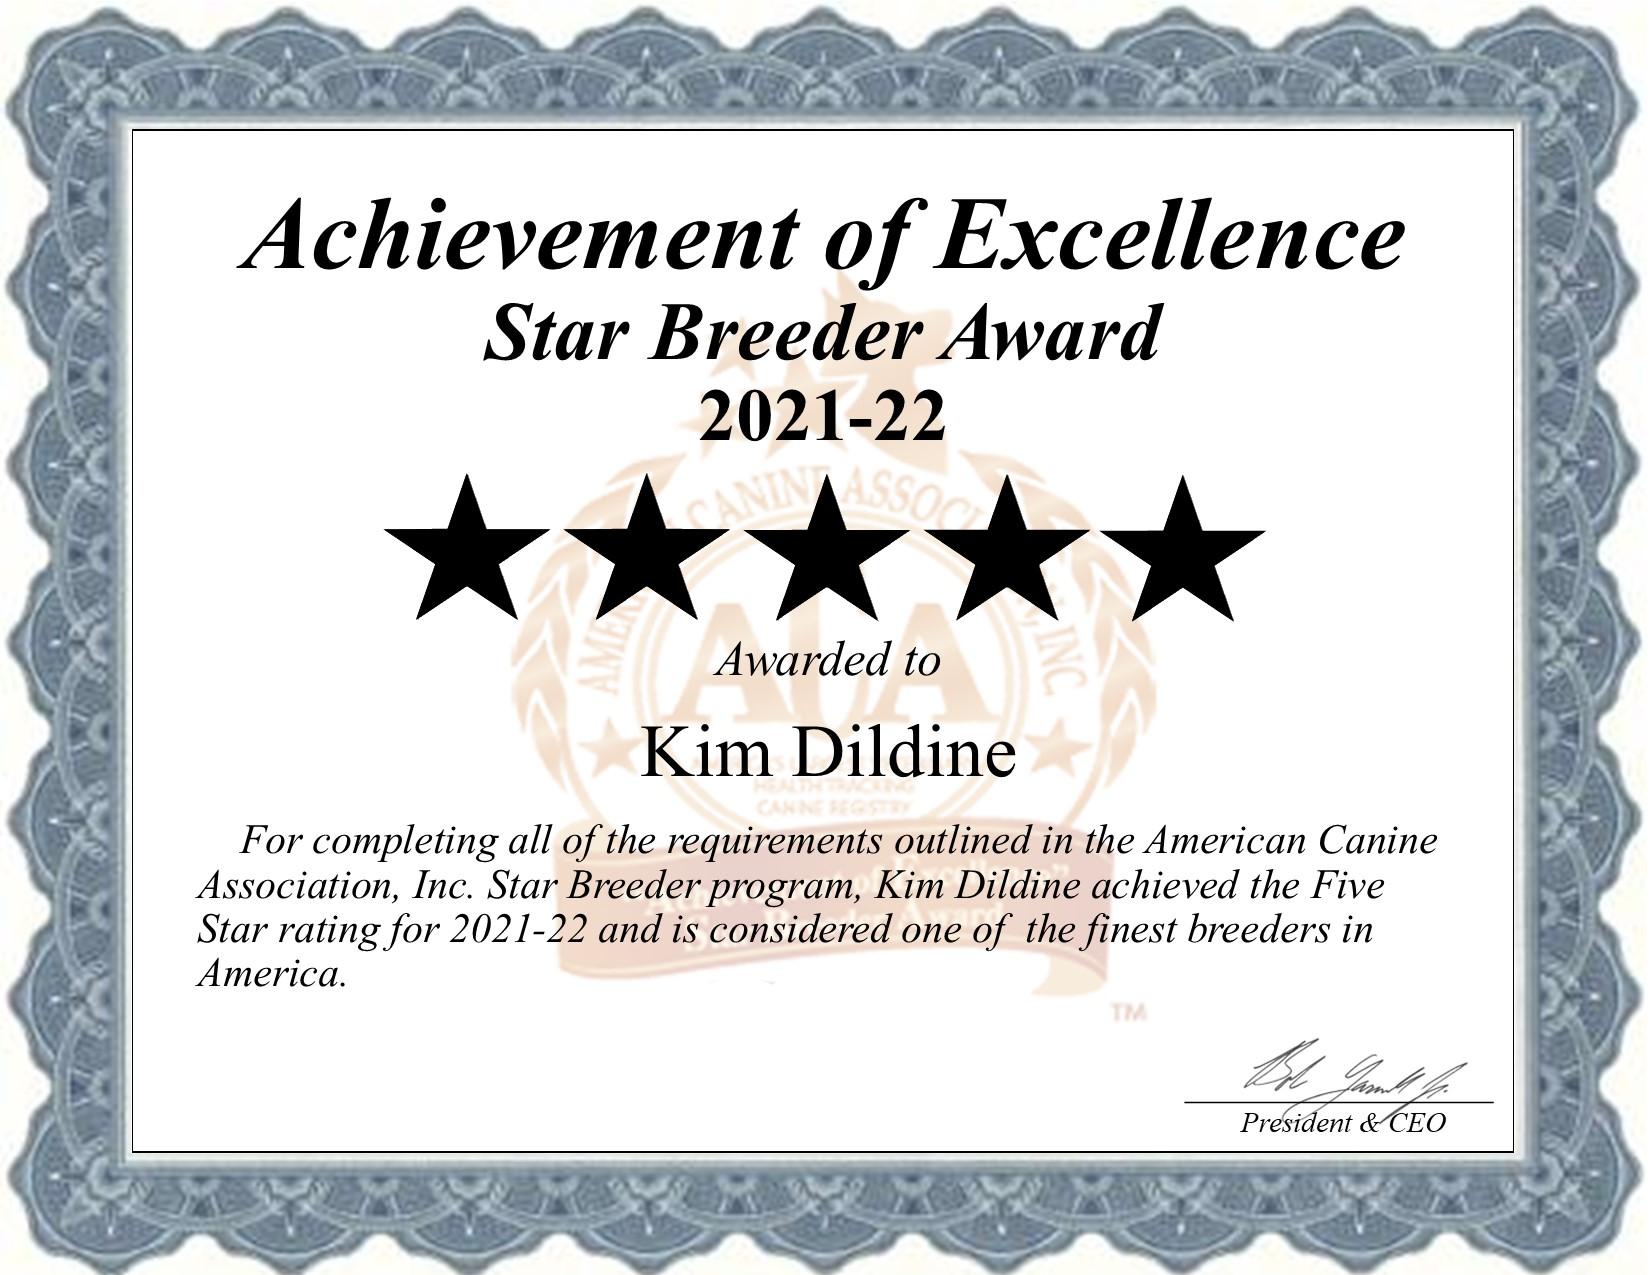 Kim, Dildine, dog, breeder, star, certificate, Kim-Dildine, Willow Springs, MO, Missouri, puppy, dog, kennels, mill, puppymill, usda, 5-star, aca, ica, registered, Geryhounds,  43-A-4273, 43A4273